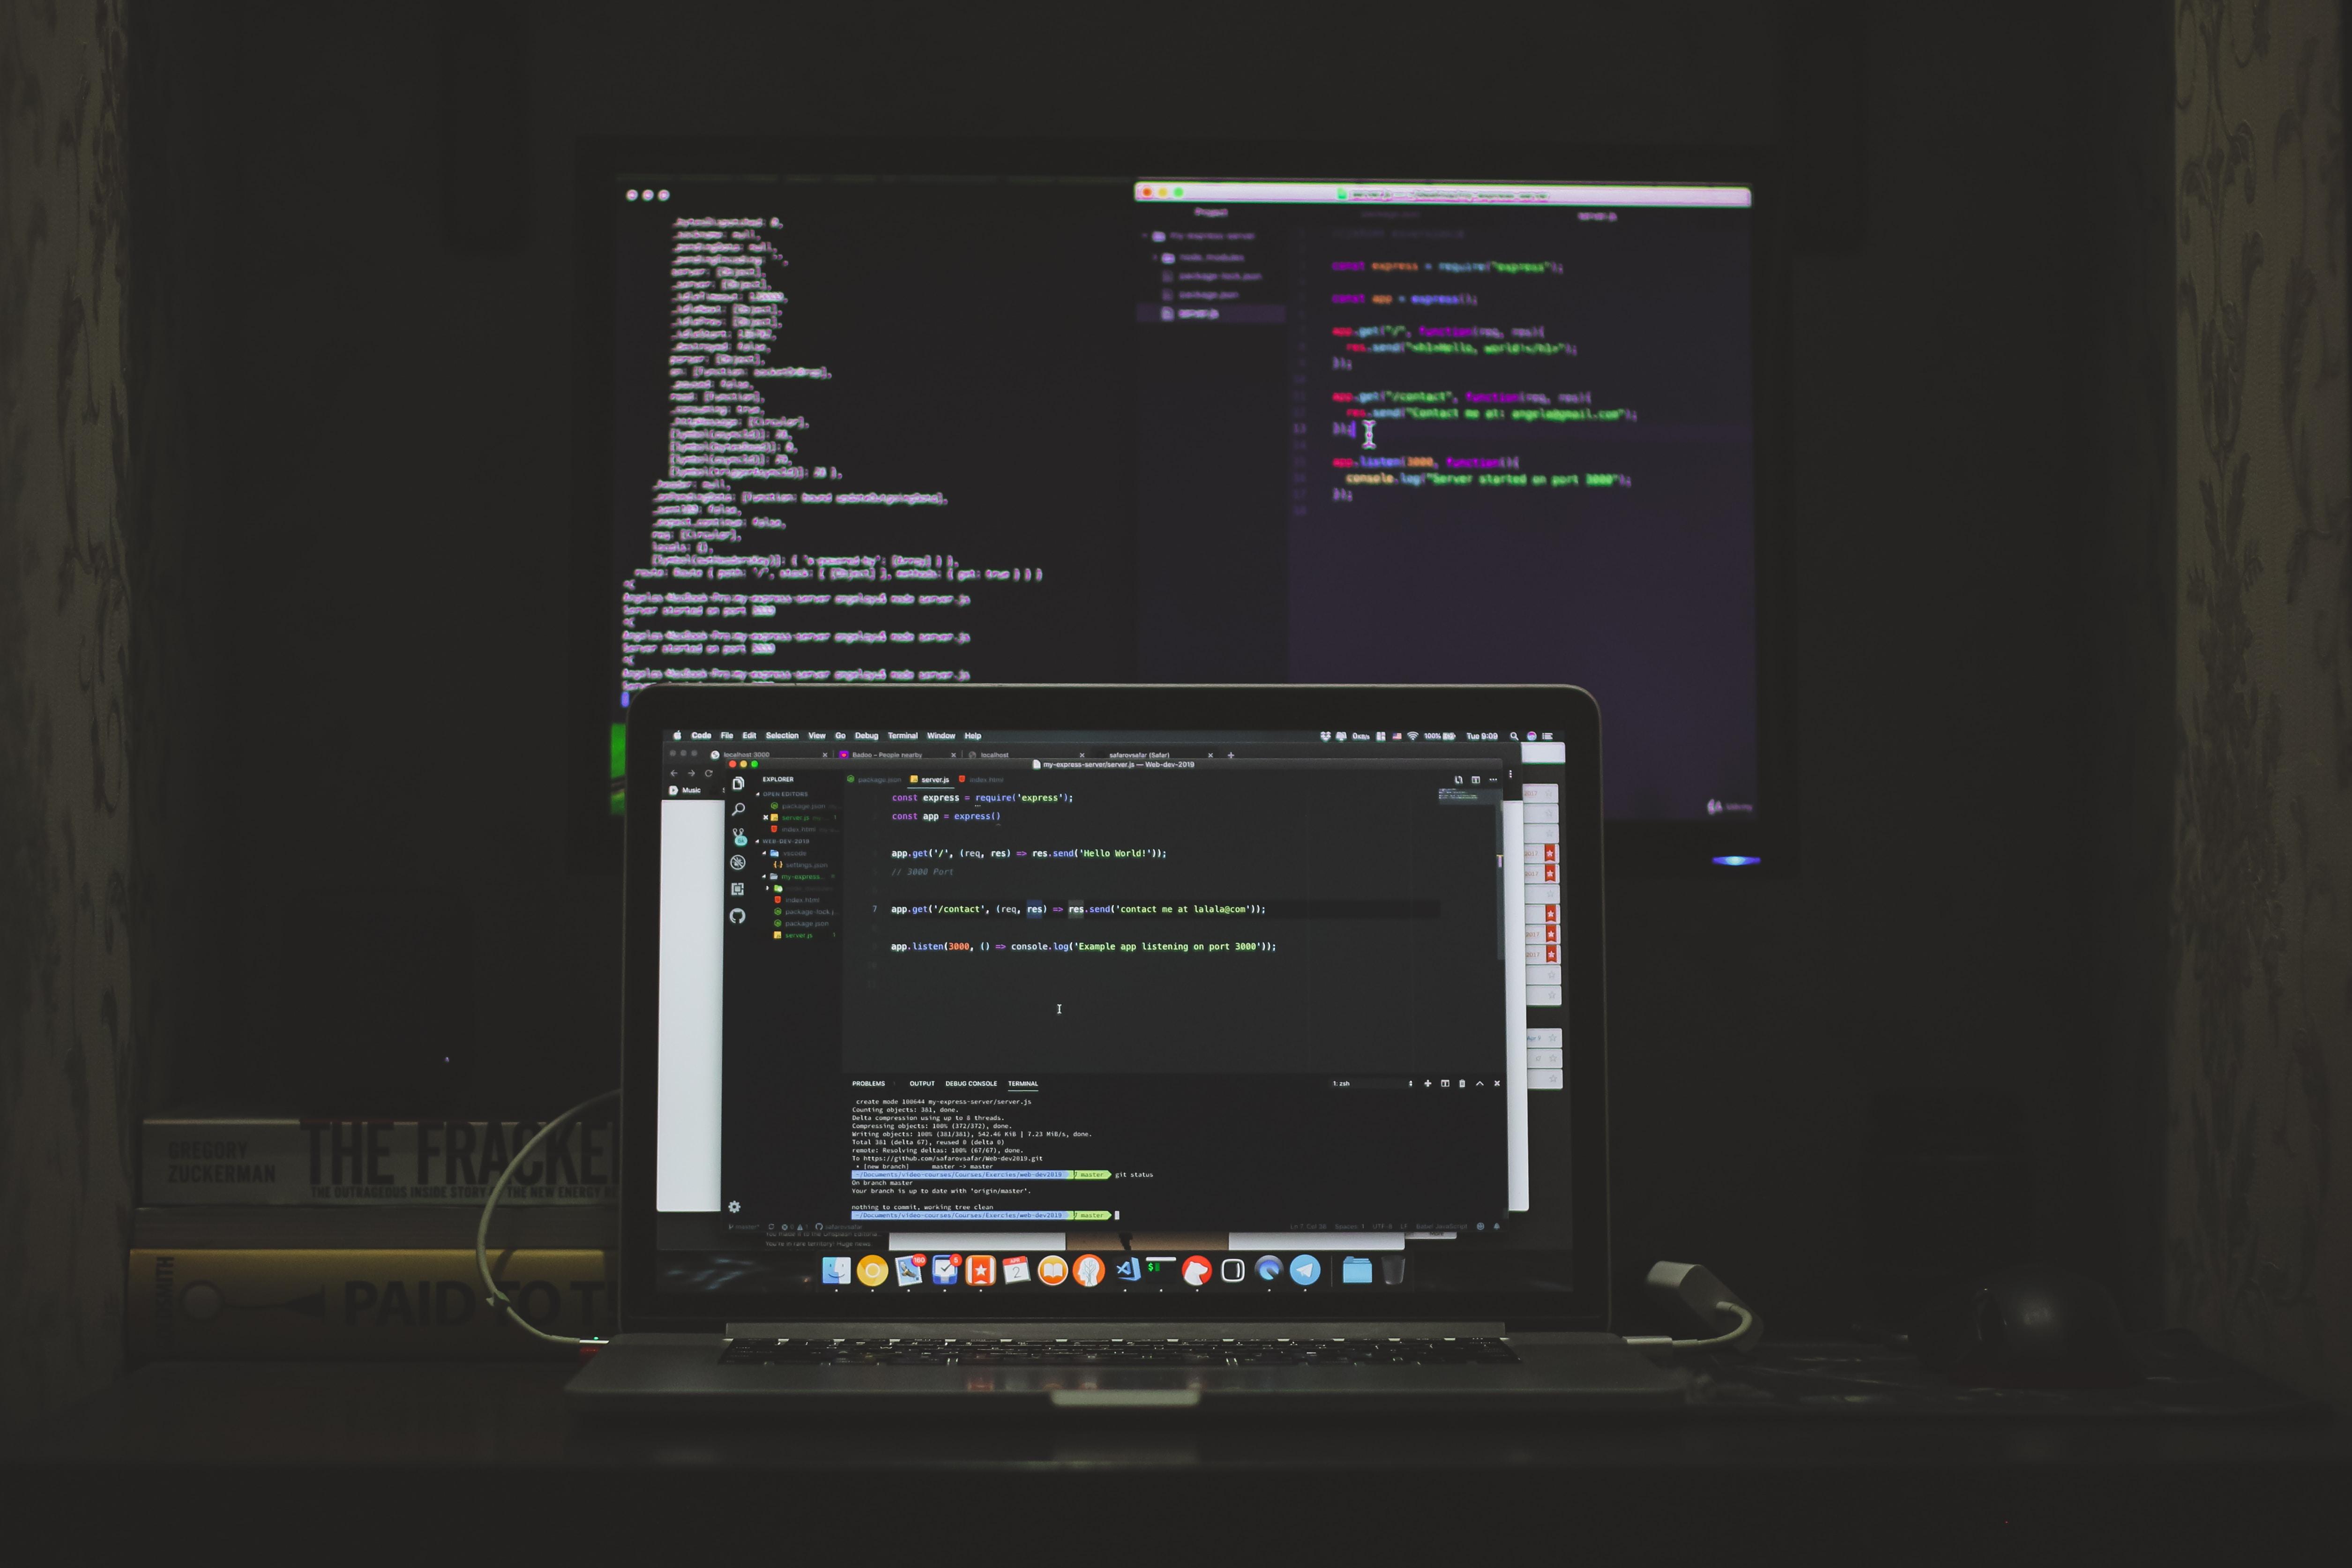 Hermes: Open-source JavaScript engine by Facebook